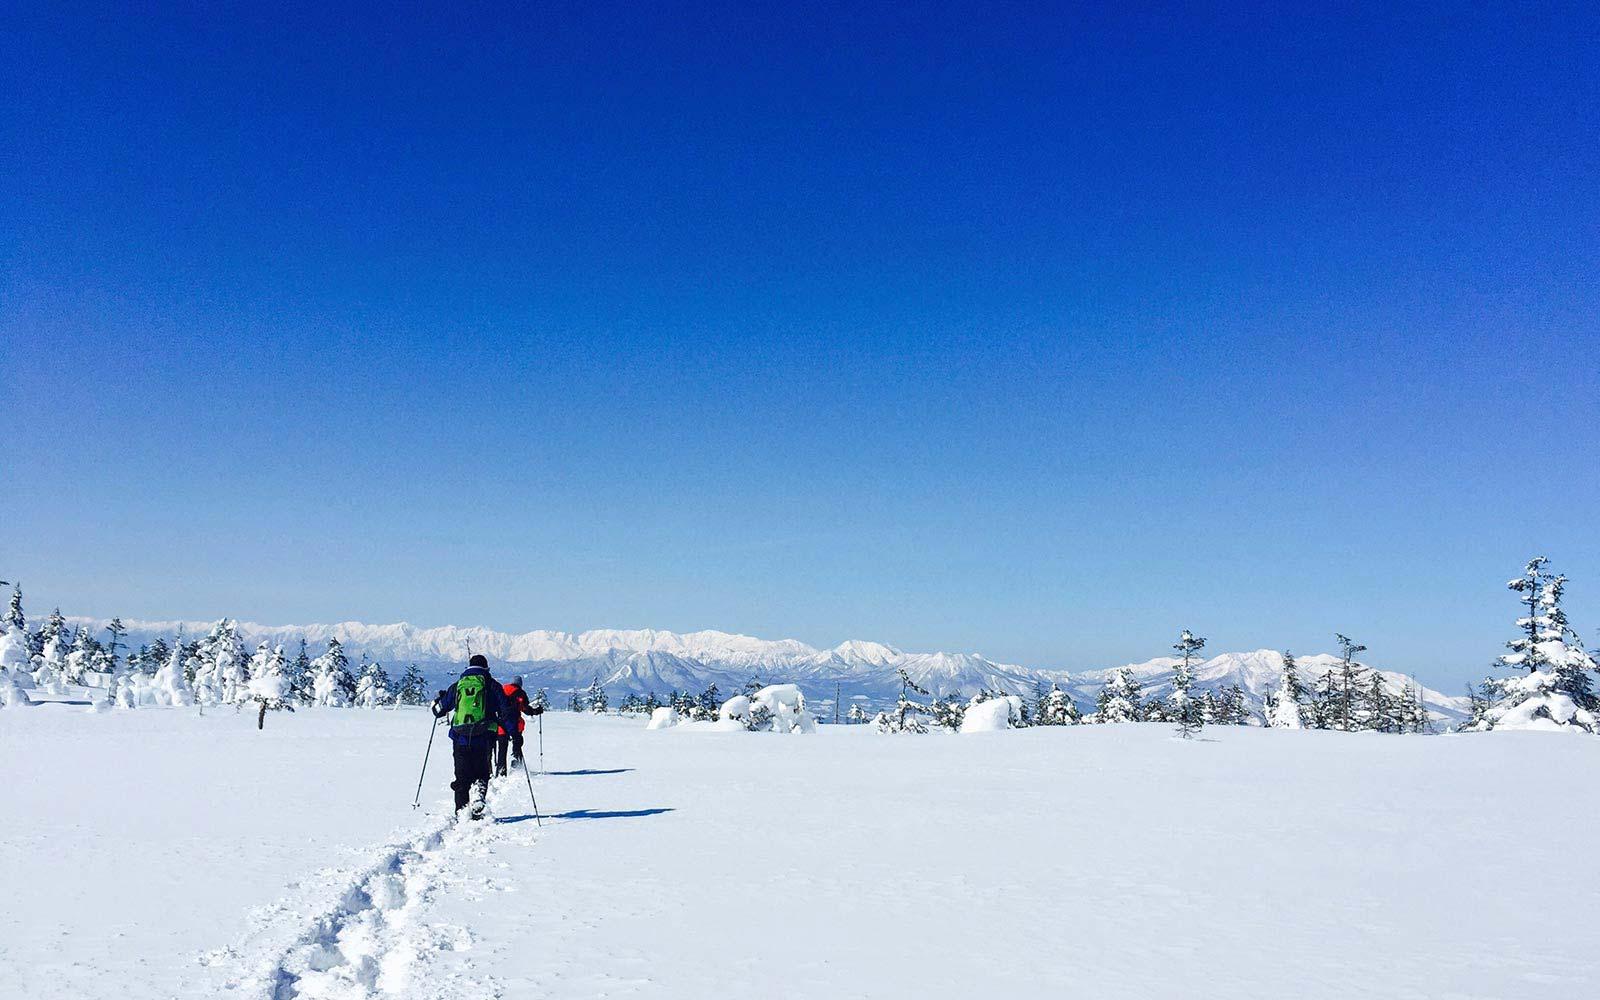 yakebitaiyama-ski-area